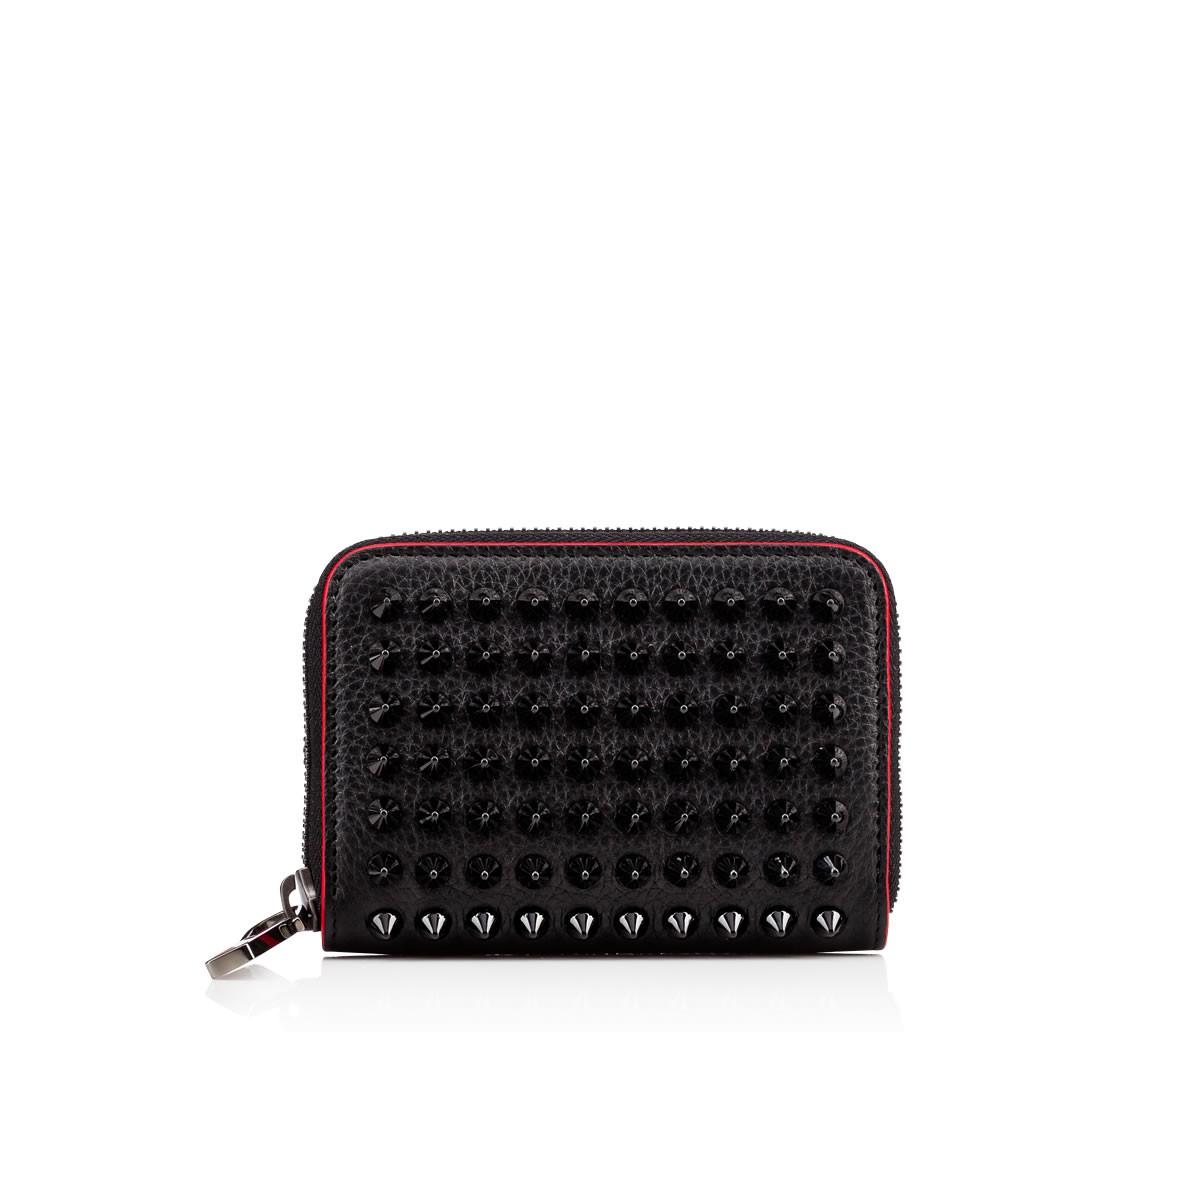 Christian Louboutin Panettone Zipped Coin Purse  Black Calfskin - Accessories -